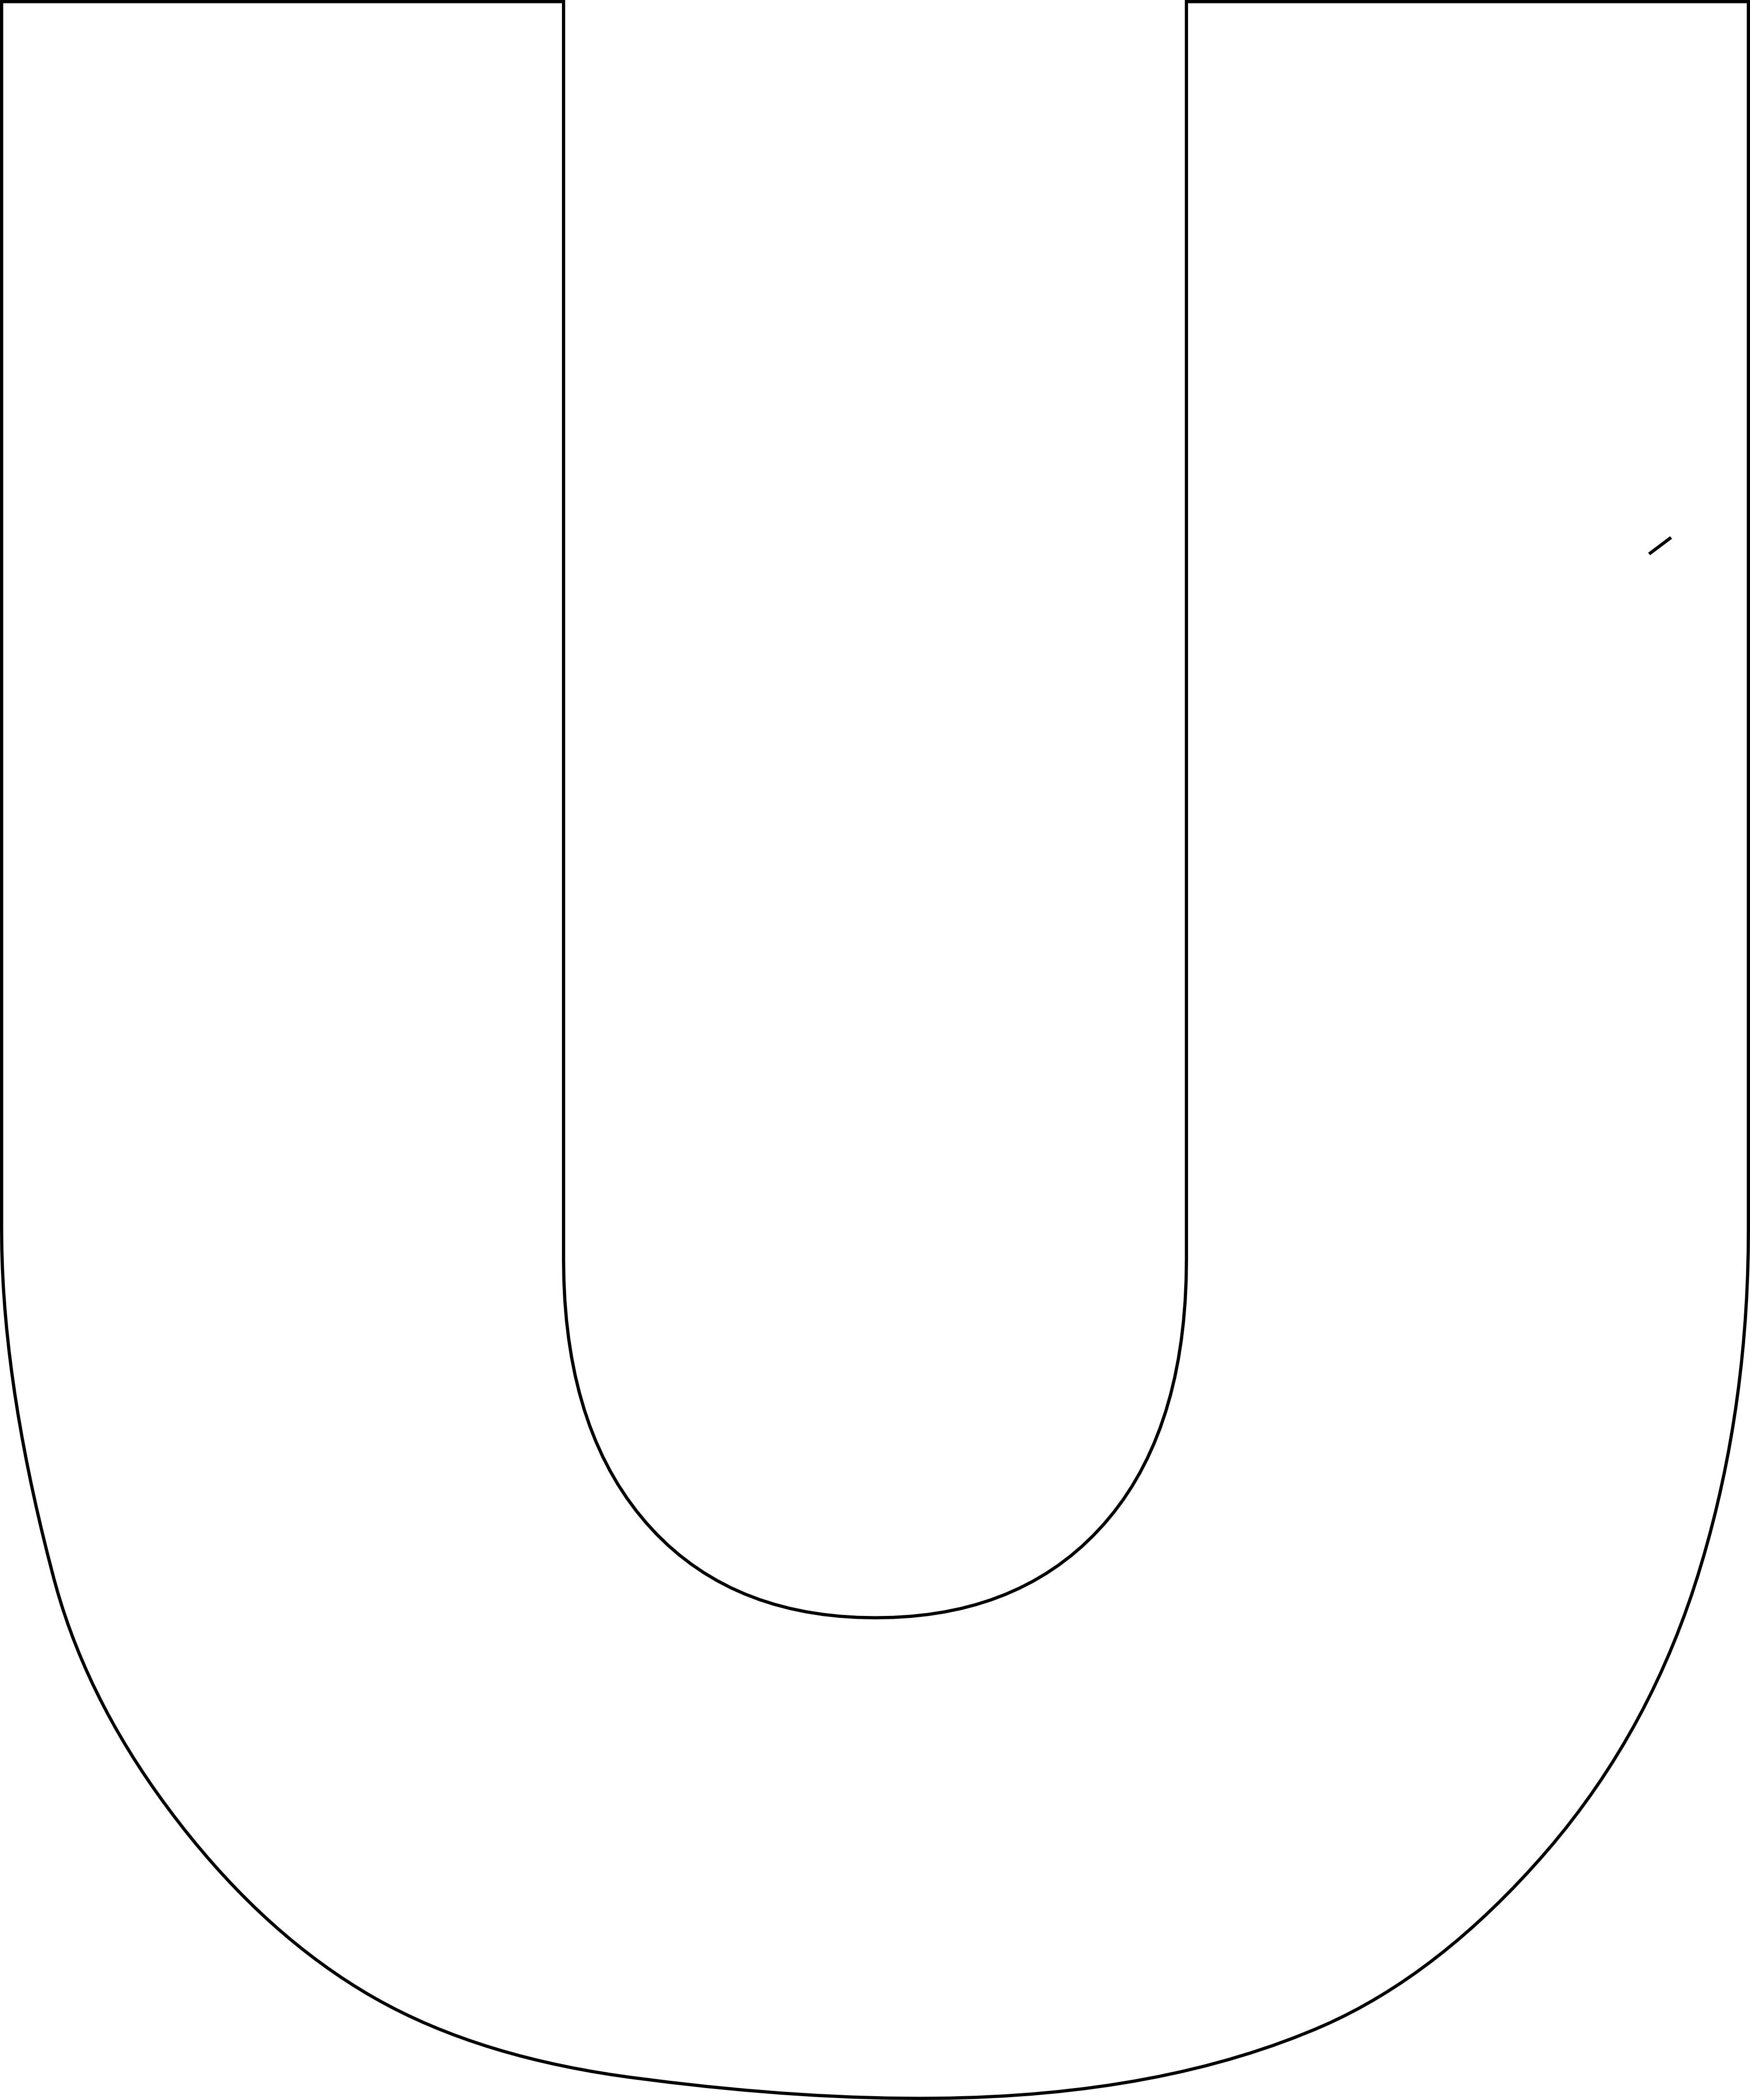 Free Printable Alphabet Template Upper Case - Free Printable Alphabet Templates